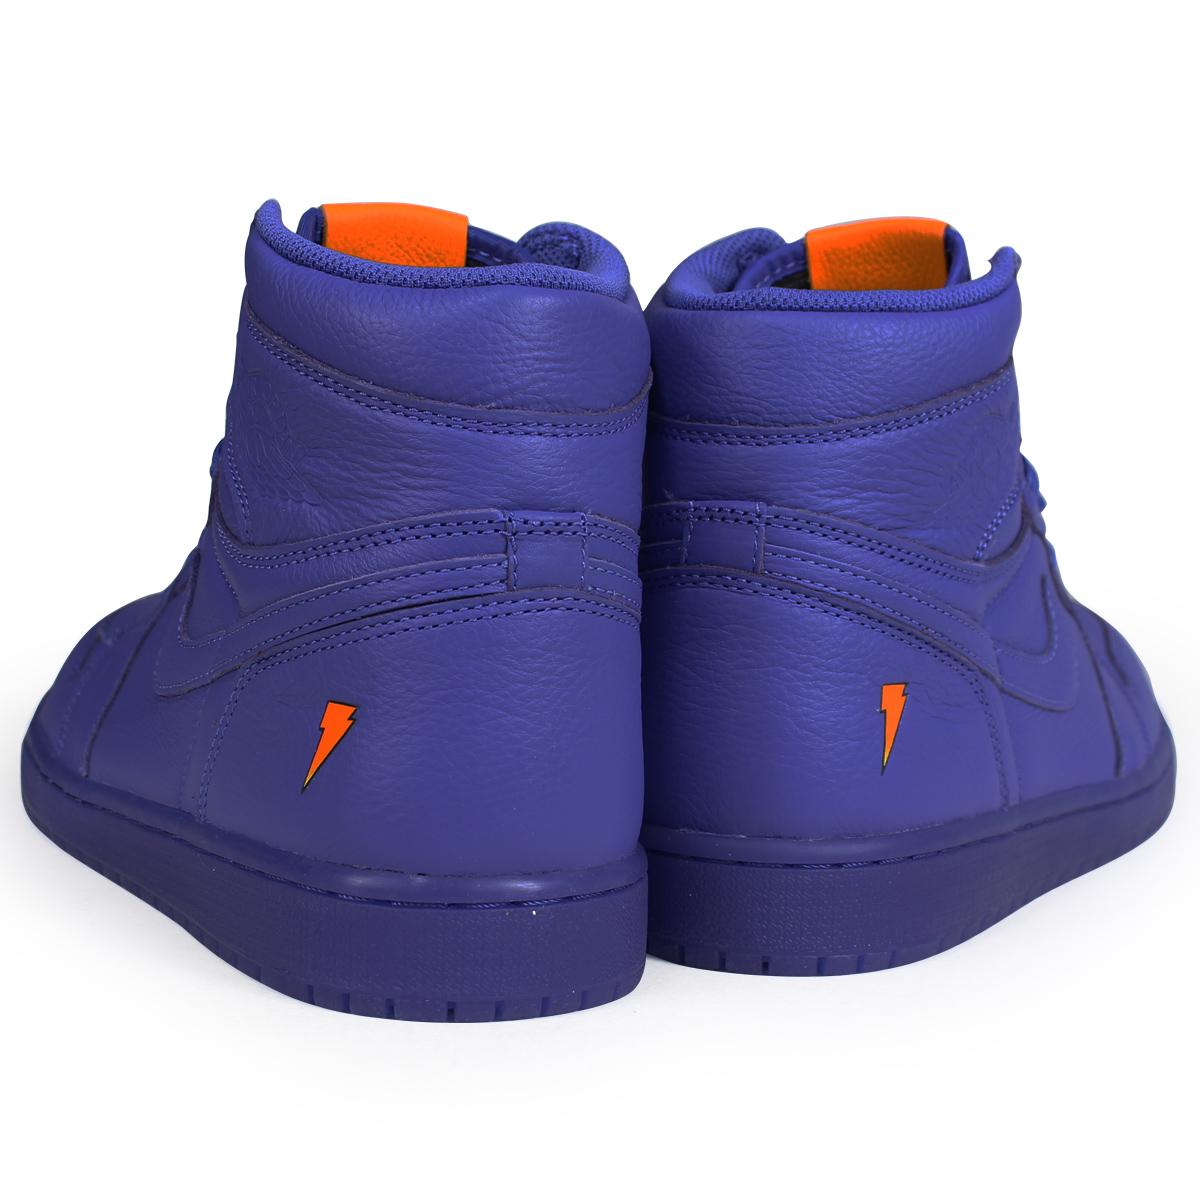 NIKE AIR JORDAN 1 RETRO HIGH OG G8RD BE LIKE MIKE GRAPE Nike Air Jordan 1  nostalgic high sneakers men AJ5997-555 blue bcf3740e8